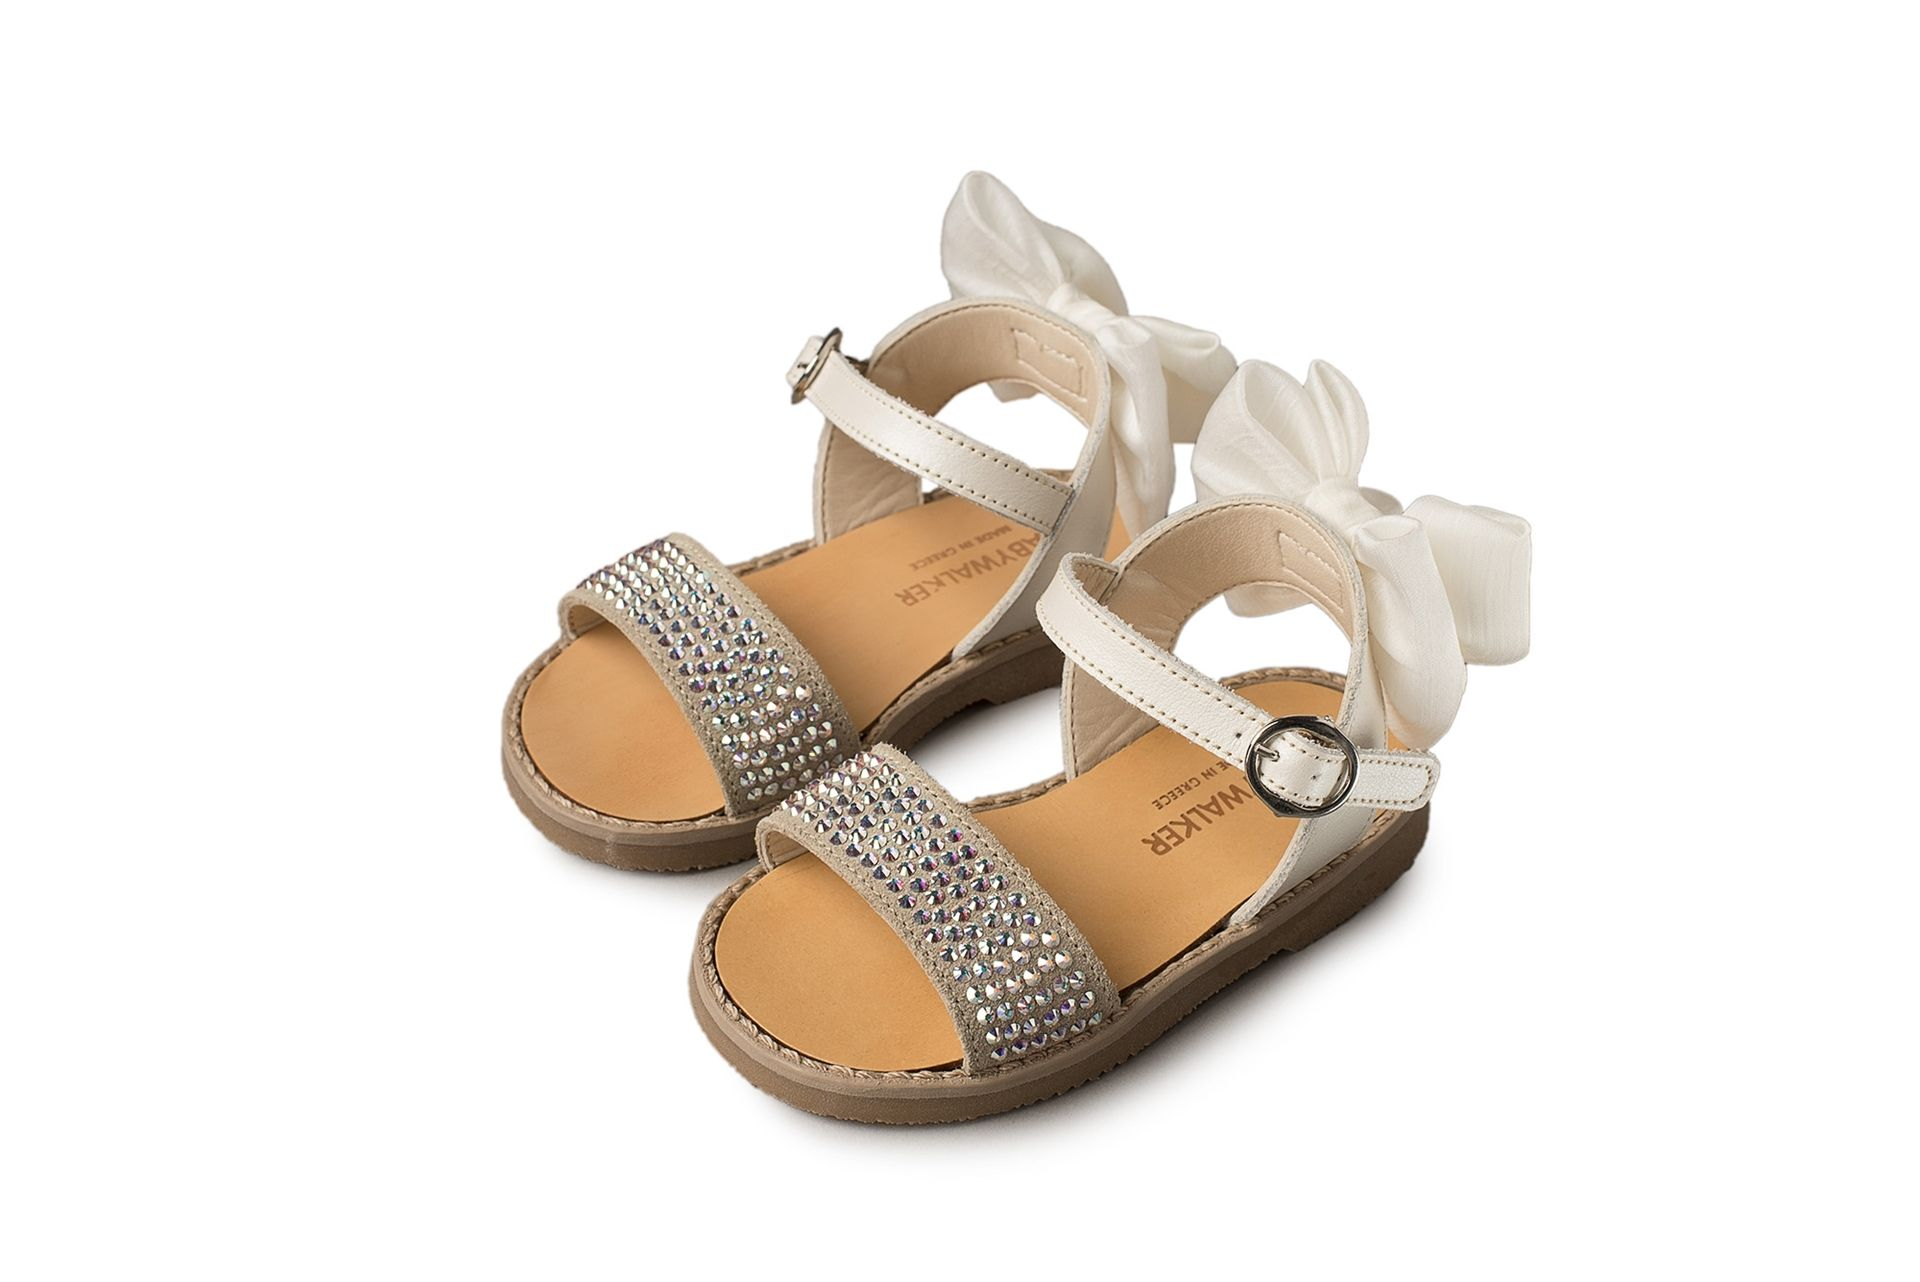 4d6cc90e4e3 Πέδιλο Βάπτισης Babywalker LU 6034 Luminosa - Βαπτιστικά Πέδιλα Κορίτσι  Τιμές-Ανατομικά-Μοντέρνα-Προσφορά | Βαπτιστικά Παπουτσάκια Για Κορίτσι |  Shoes, ...